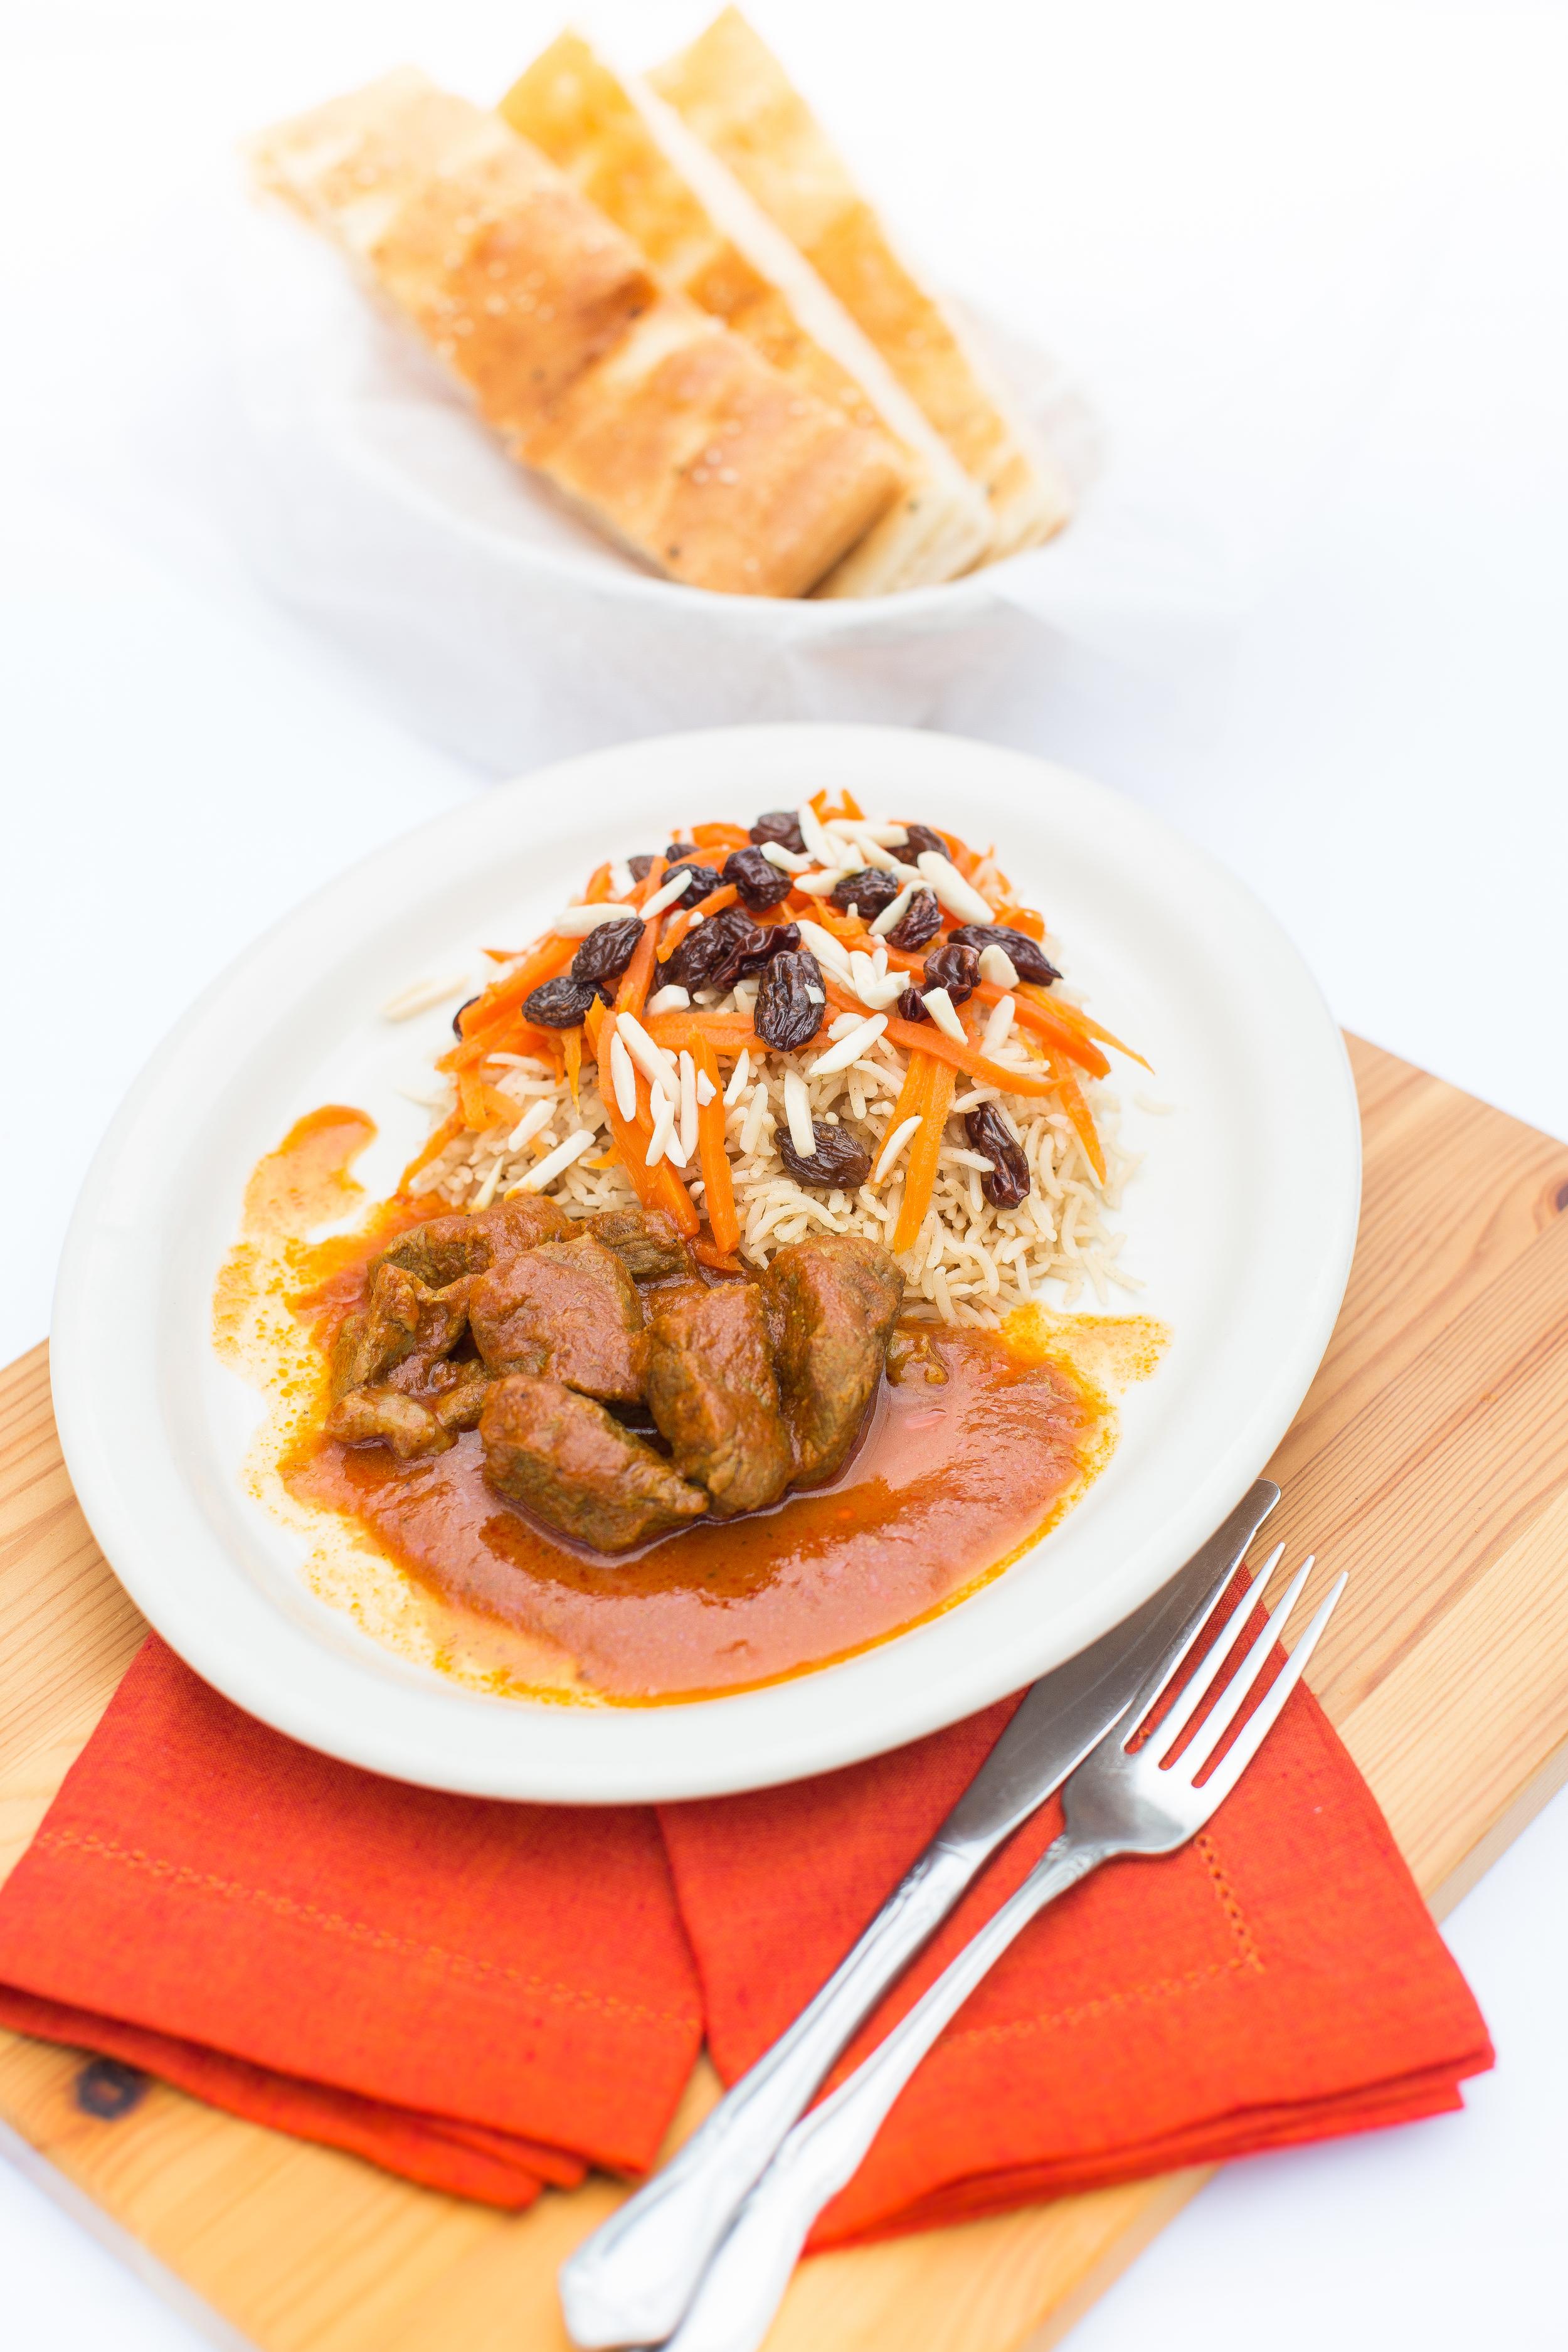 Panjshir-Cam-2-vertical-5-nabu-food-photography.jpg